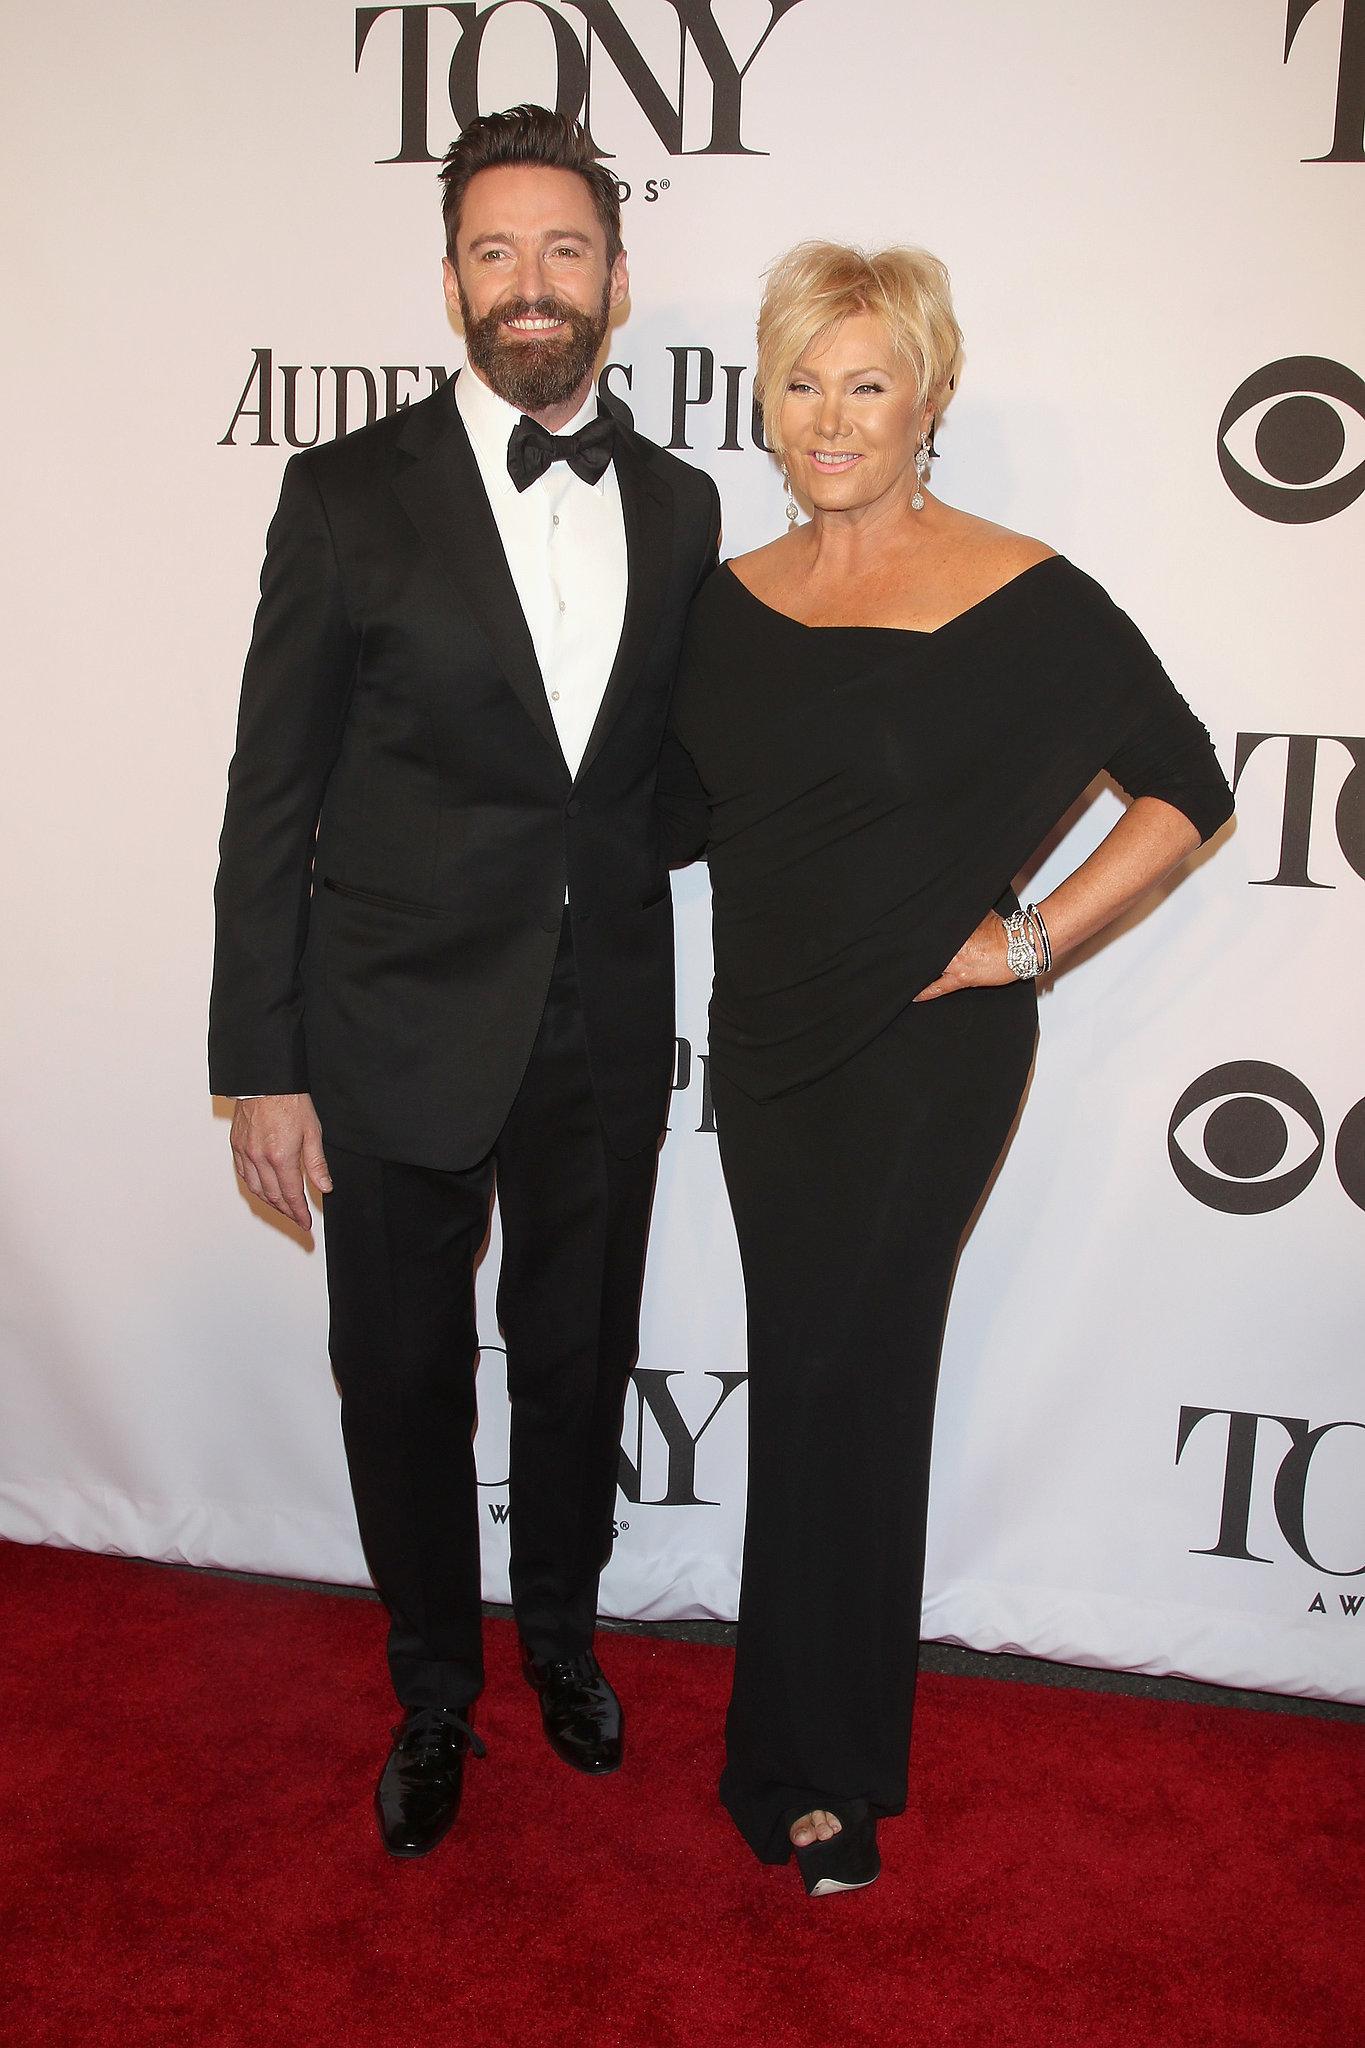 Hugh Jackman arrived with his wife, Deborra-Lee Furness.